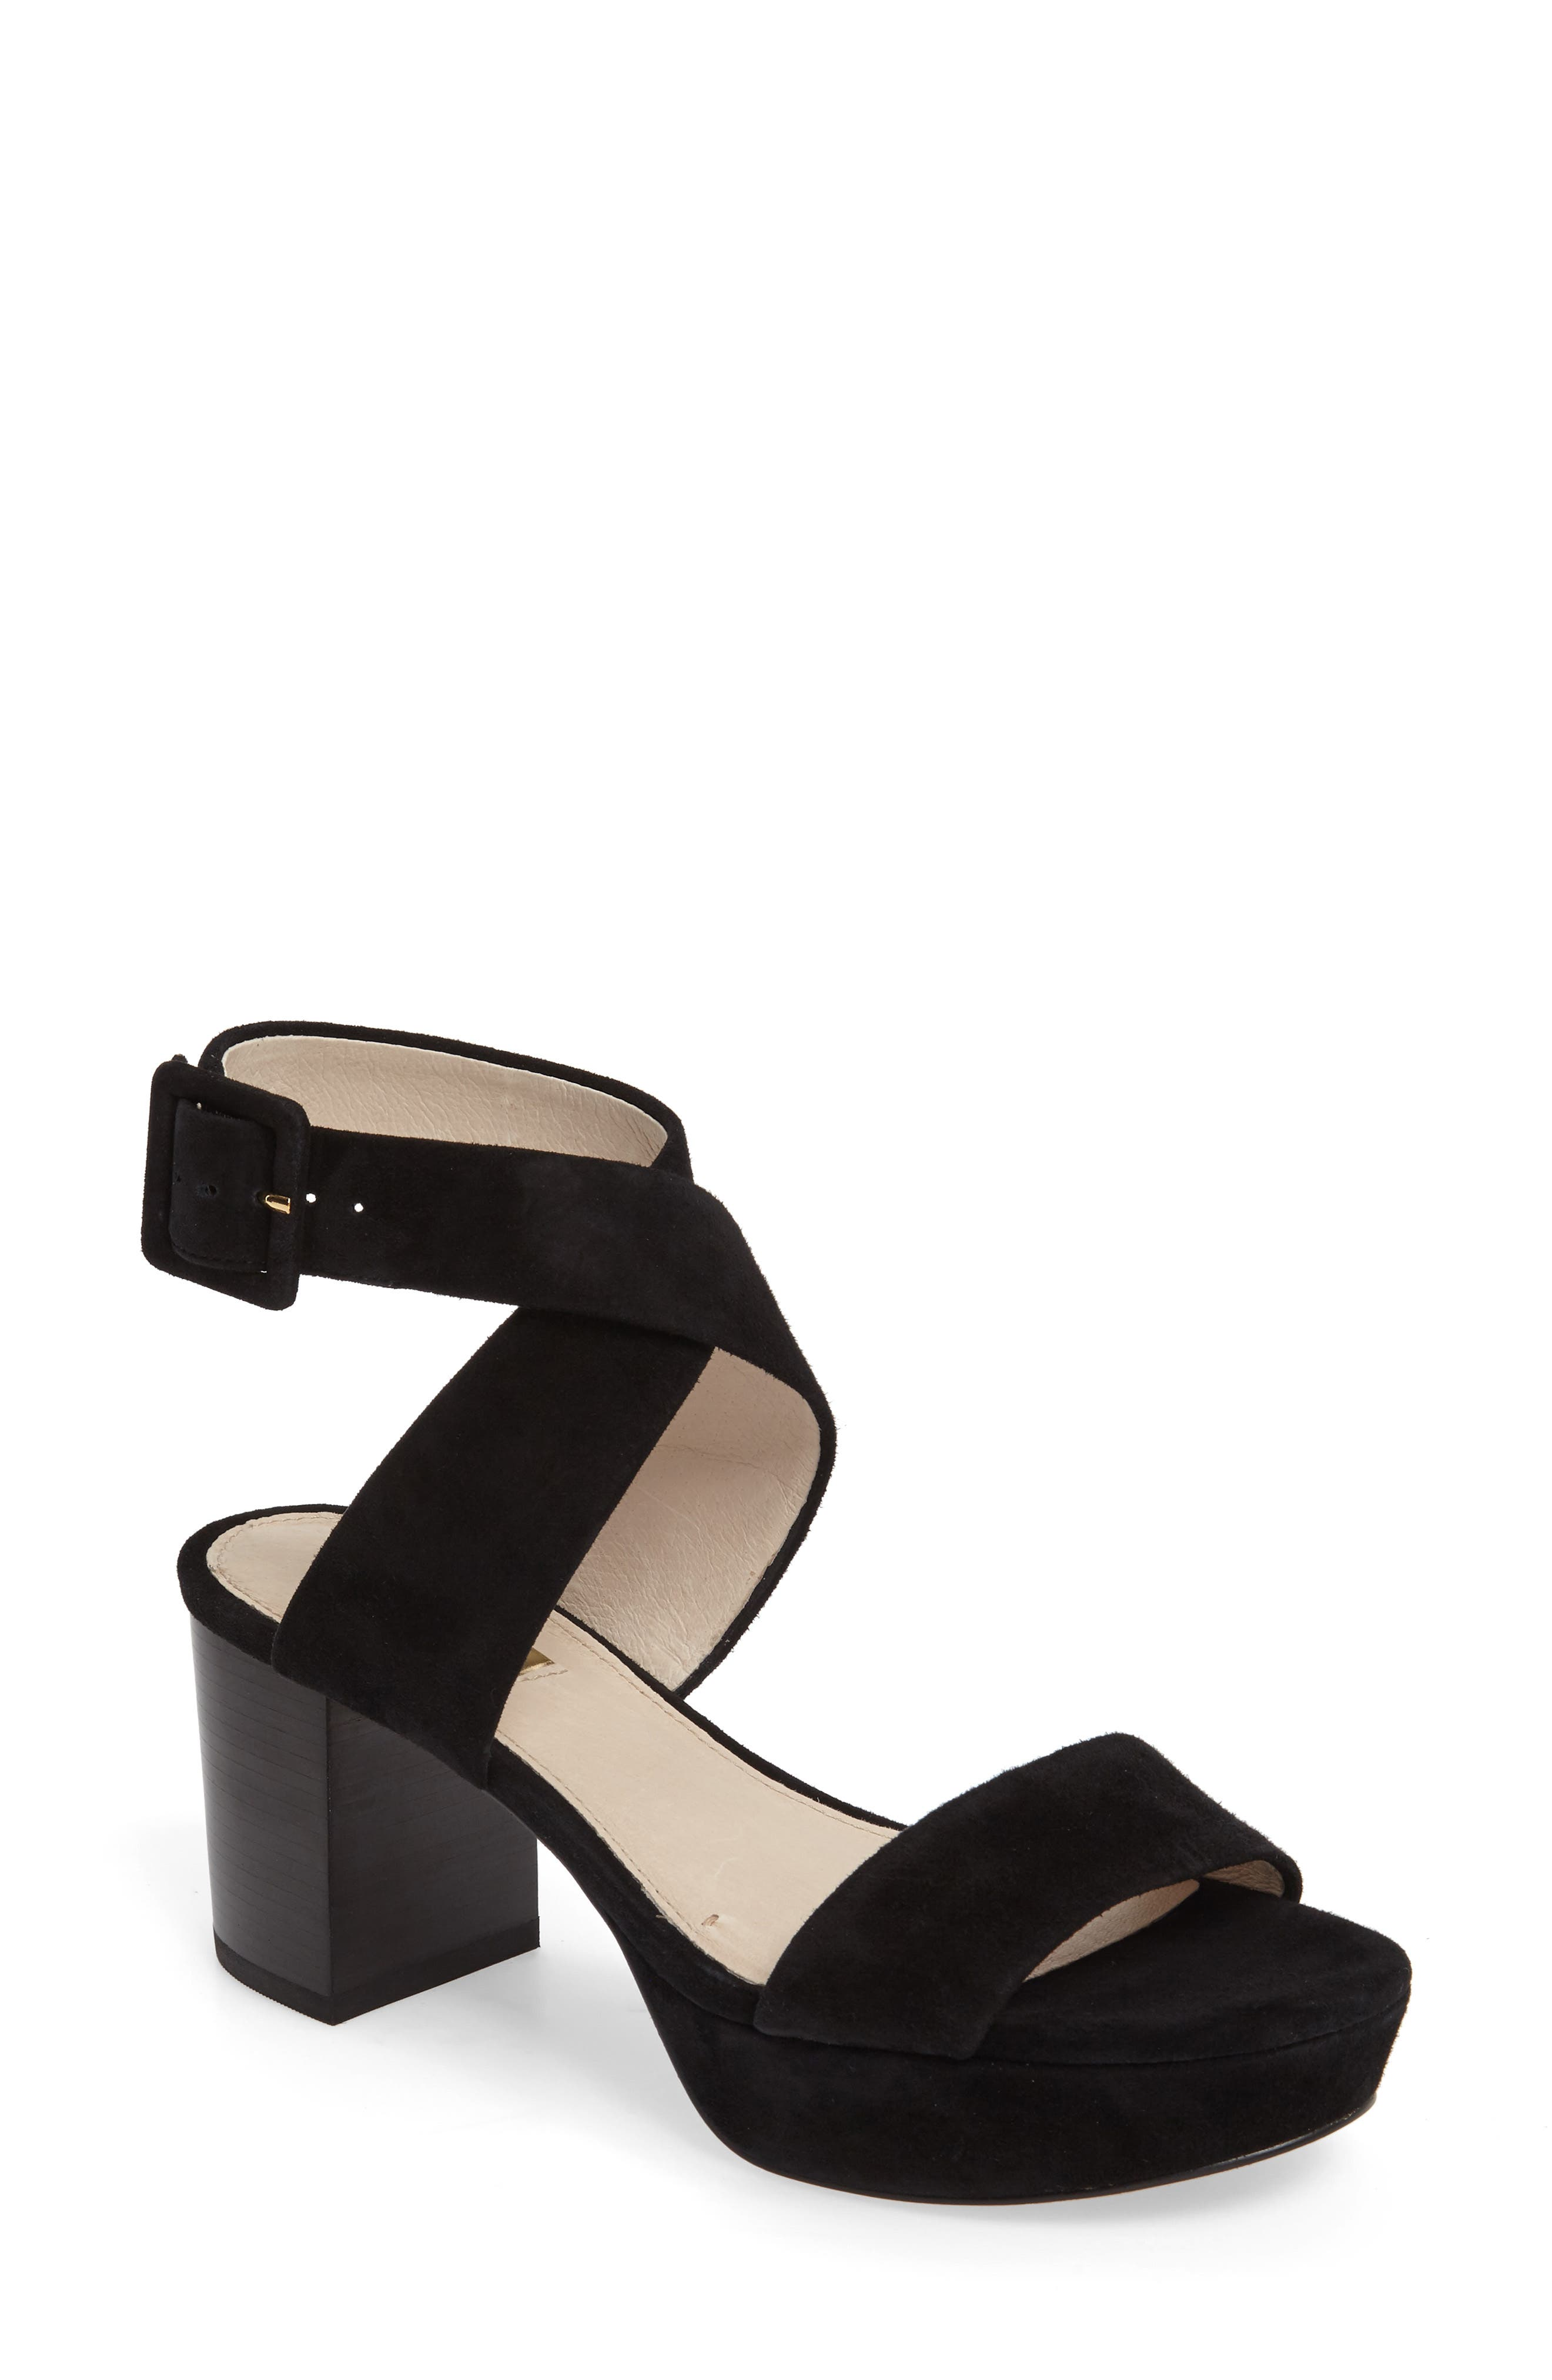 Alternate Image 1 Selected - Louise et Cie Harmony Block Heel Sandal (Women)